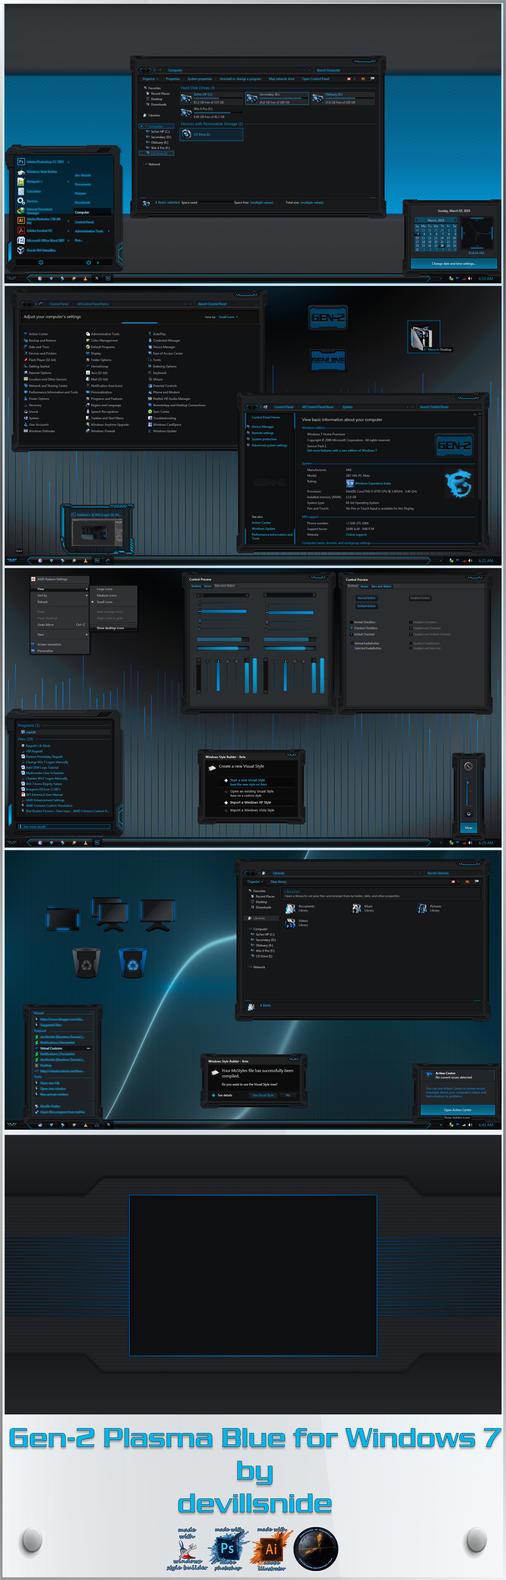 Gen-2: Plasma Blue Windows 10 Edition RS5